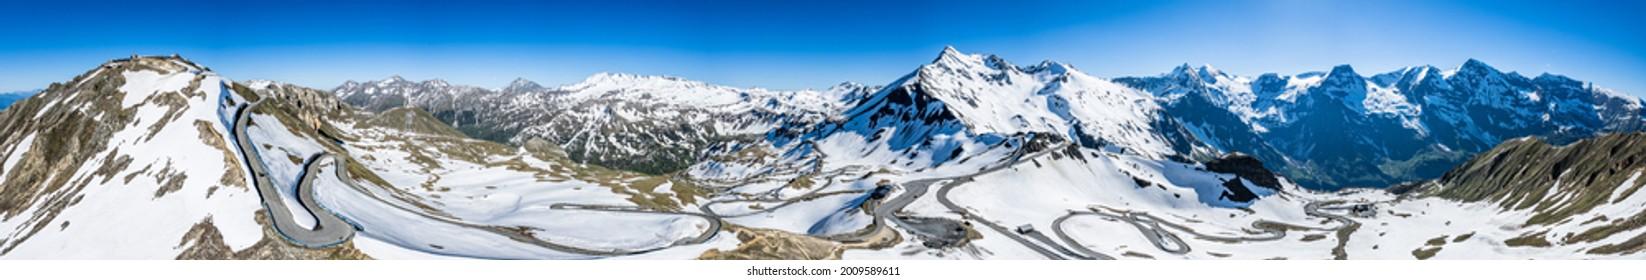 landscape at the Grossglockner Mountain in Austria